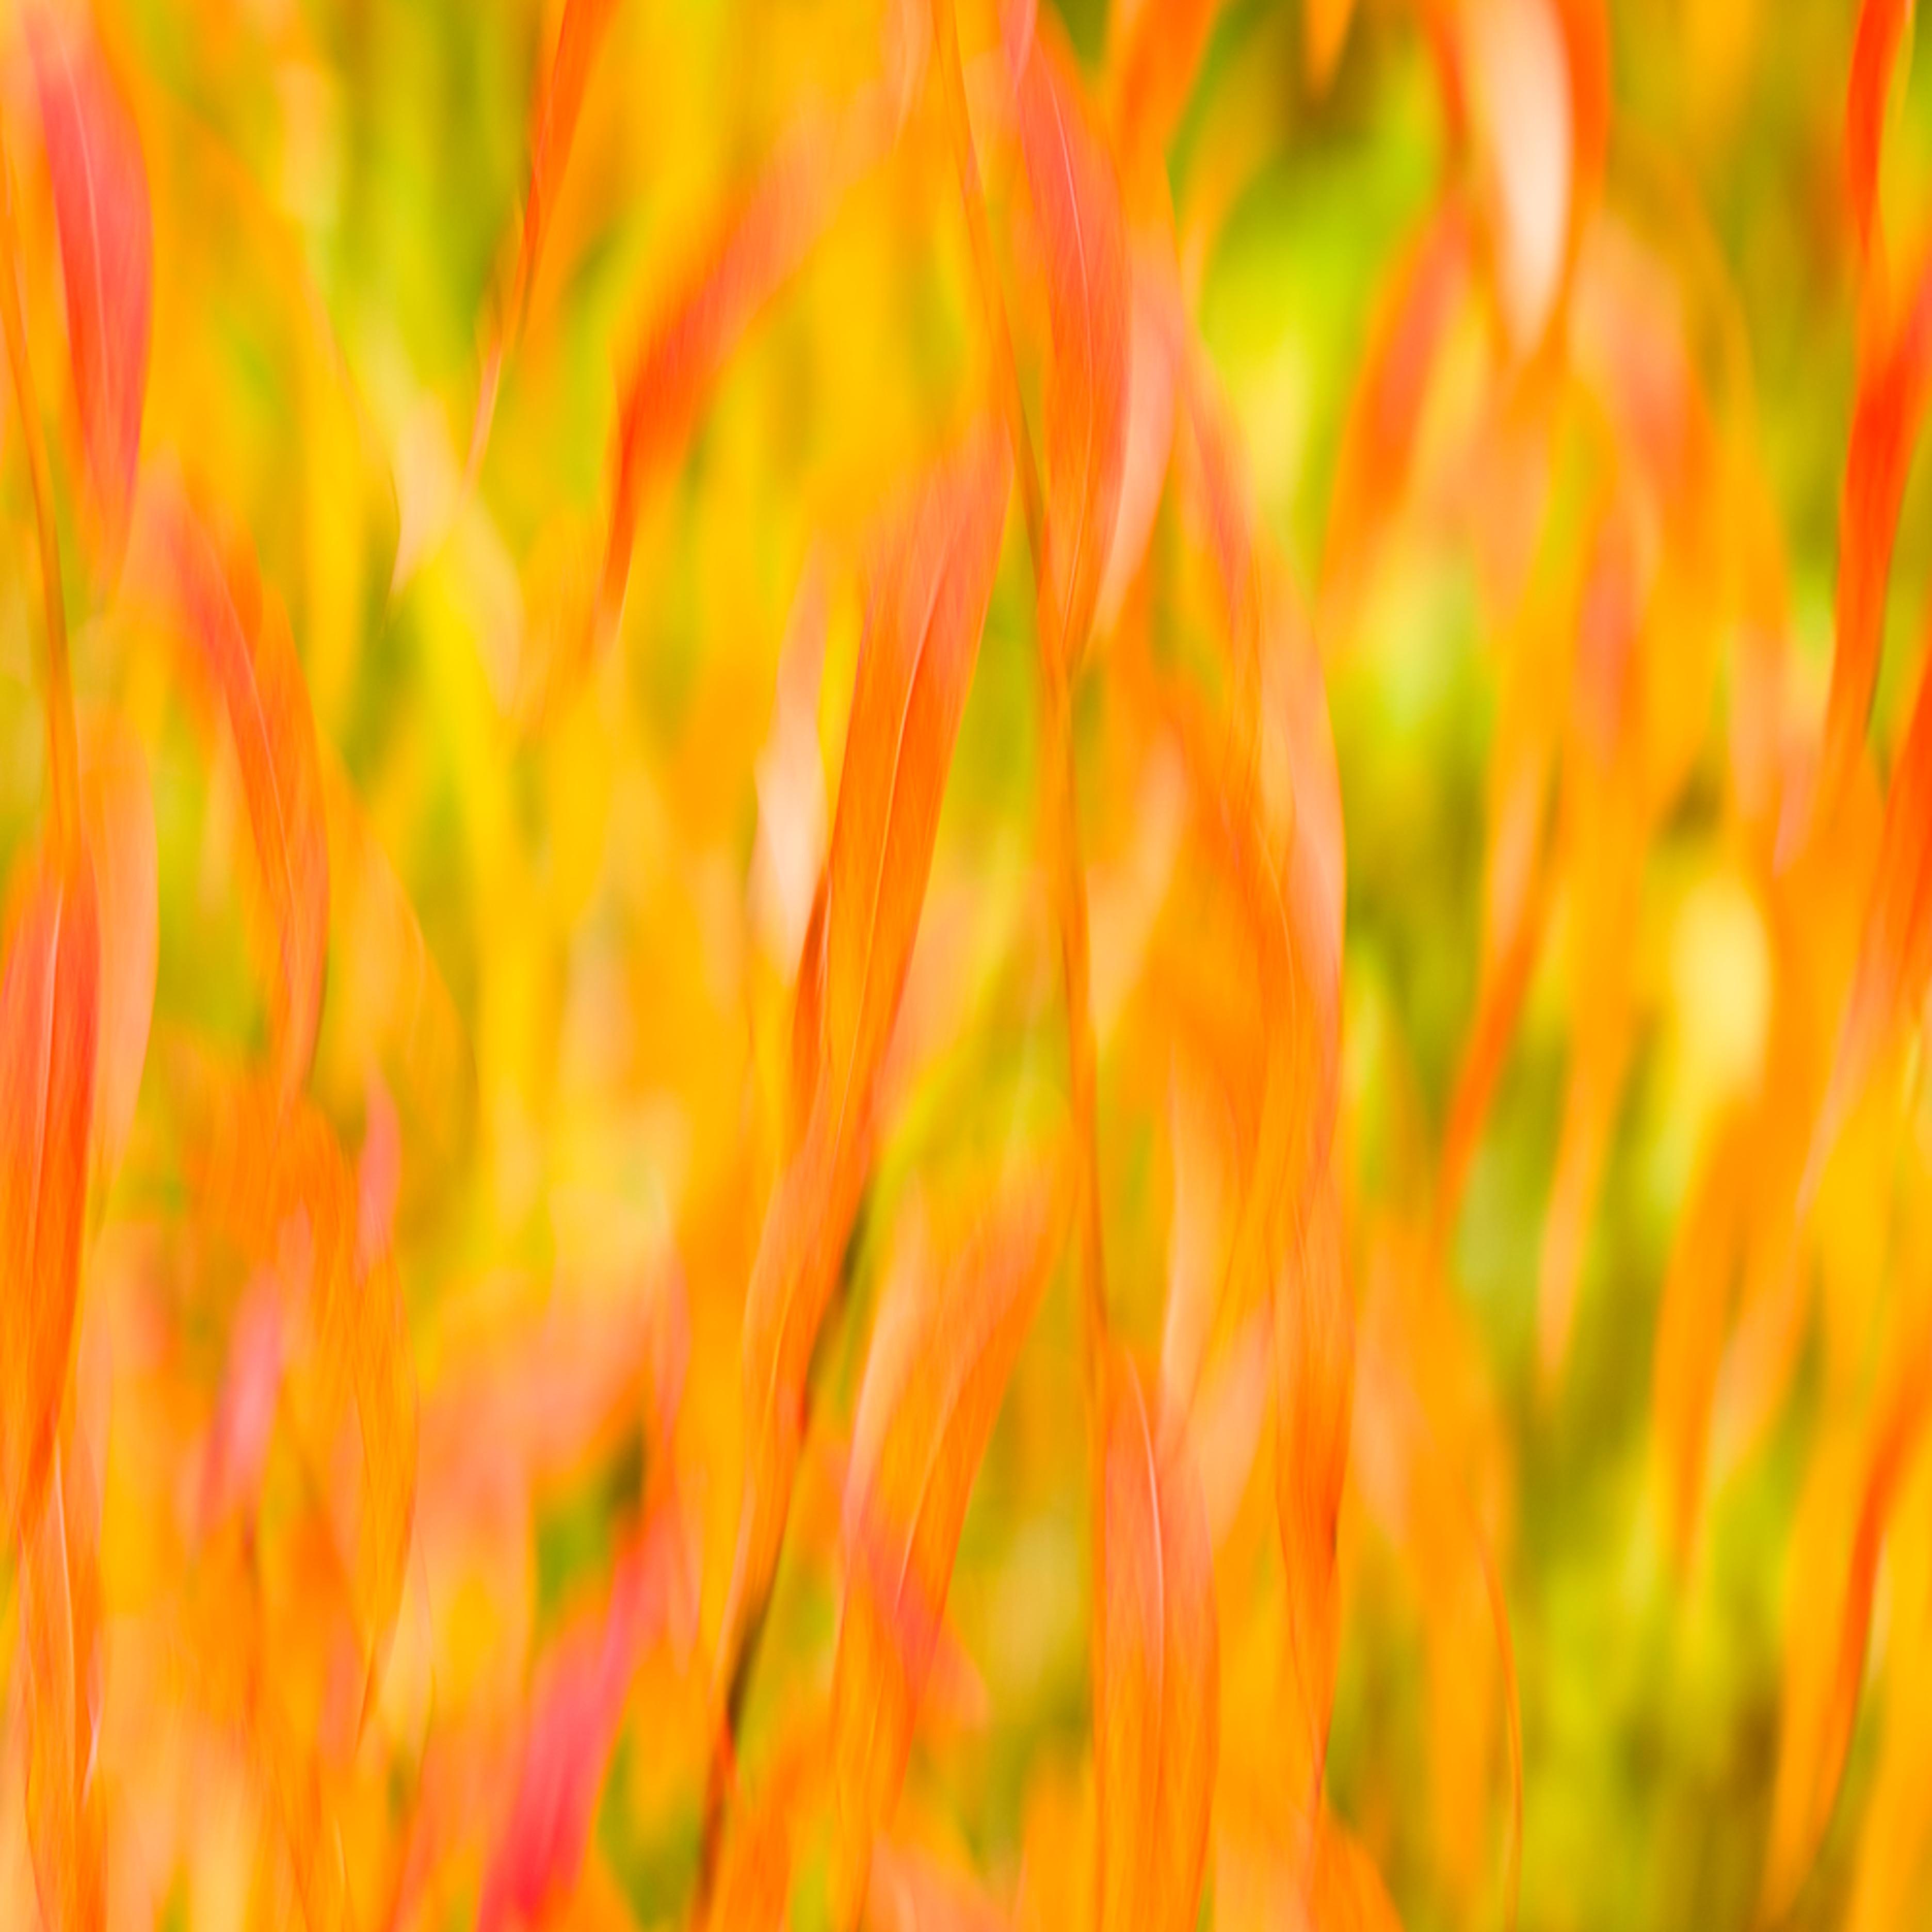 20110917 wildflowers mg2854 artstorefronts apqg4x